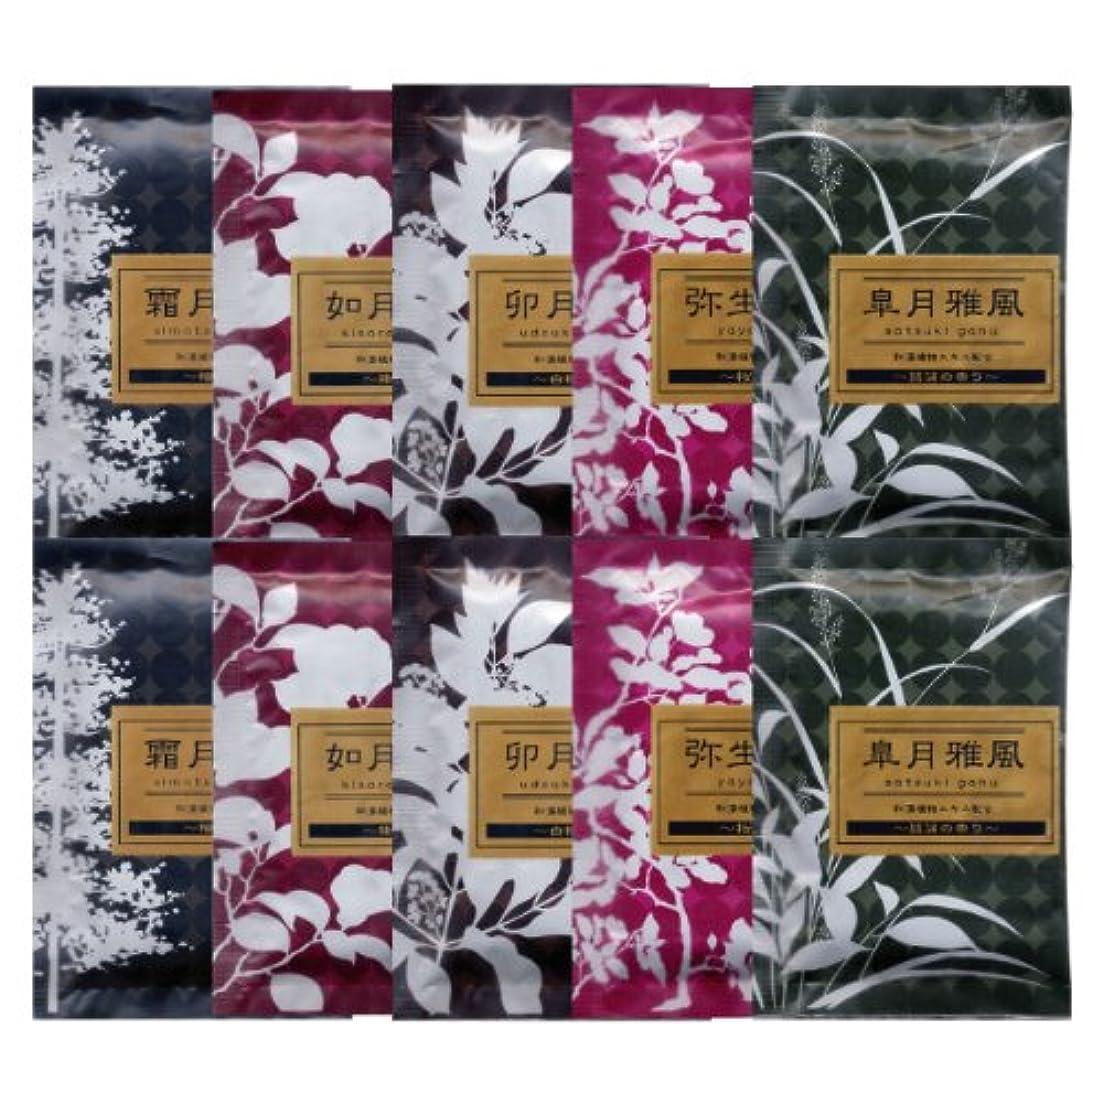 その他発見関税薬用入浴剤 綺羅の刻 5種類×2 10包